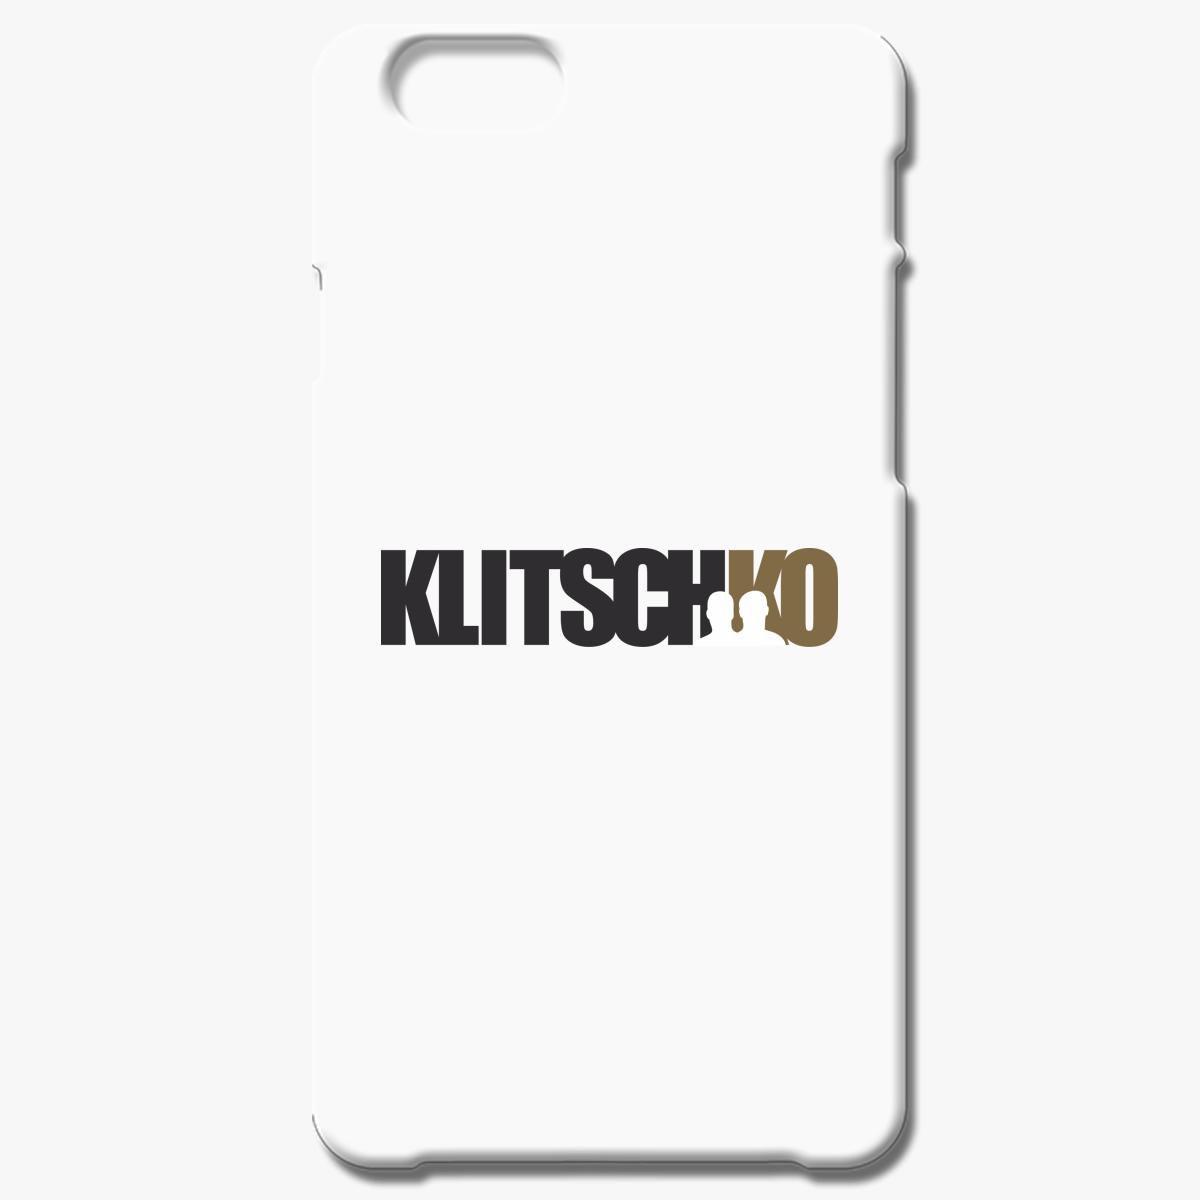 Witali And Wladimir Klitscko Iphone 6 6s Plus Case